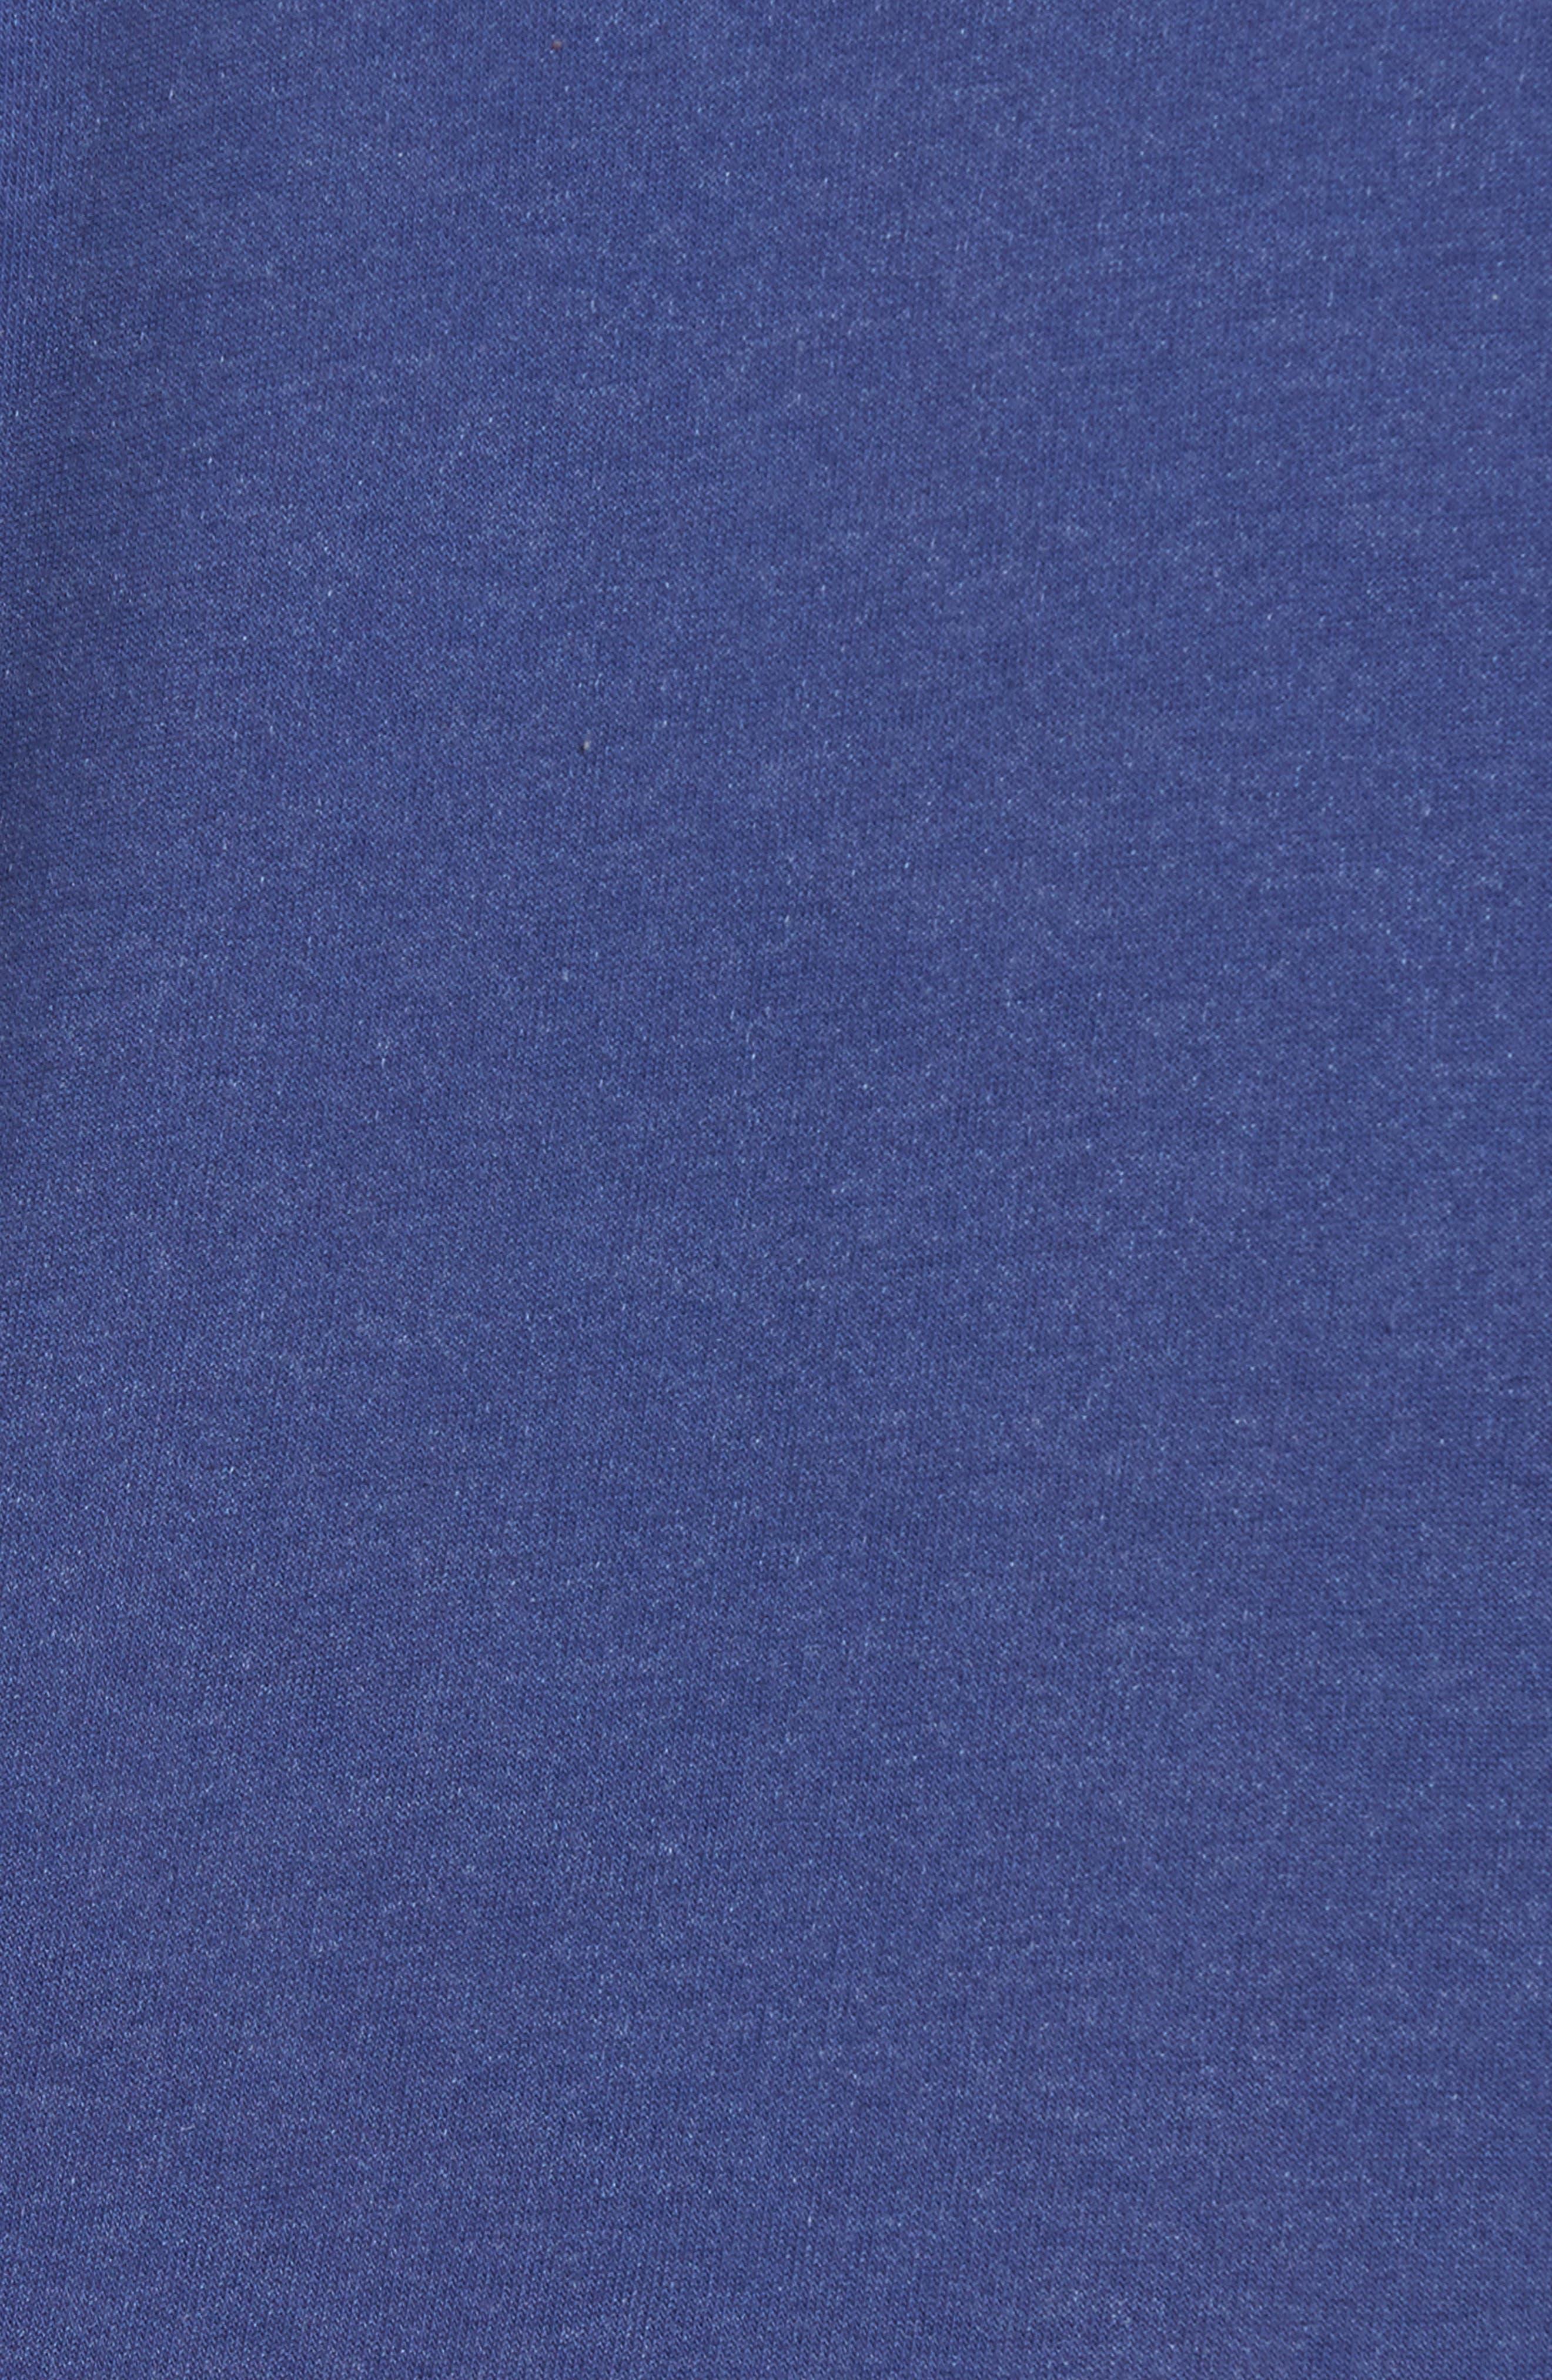 Cowgirl Sweatshirt,                             Alternate thumbnail 5, color,                             Cowboy Blue